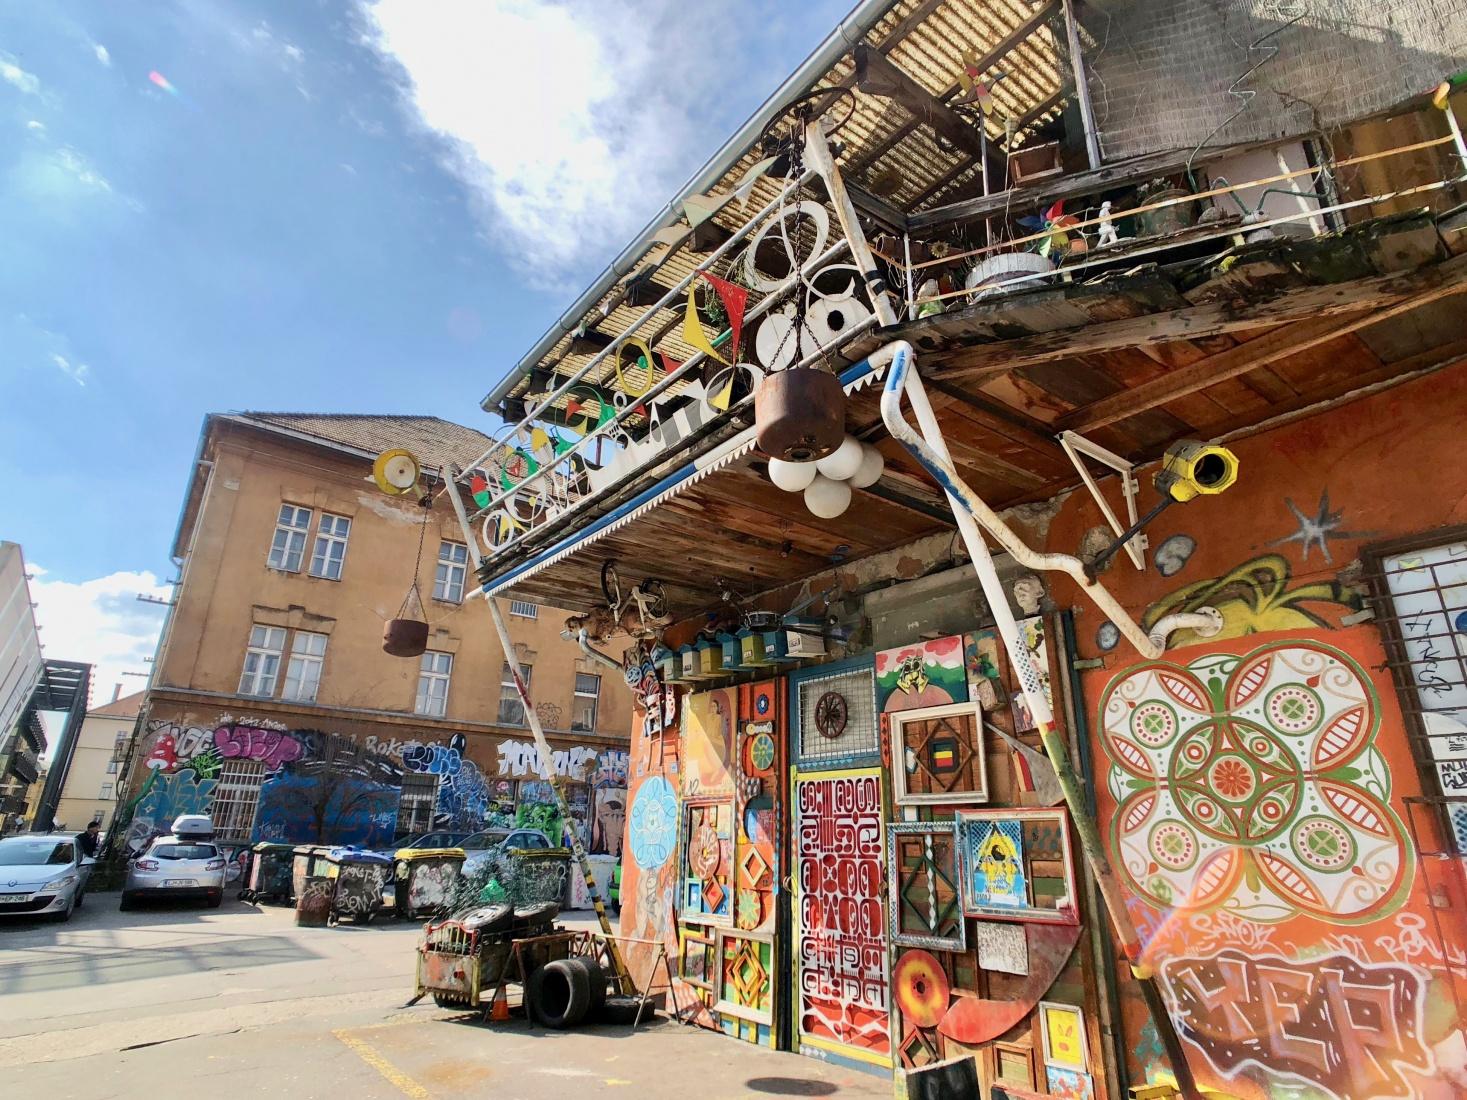 Graffiti-covered corner building at the Metelkova Mesto squat in Ljubljana, Slovenia, with street art in a residential area.